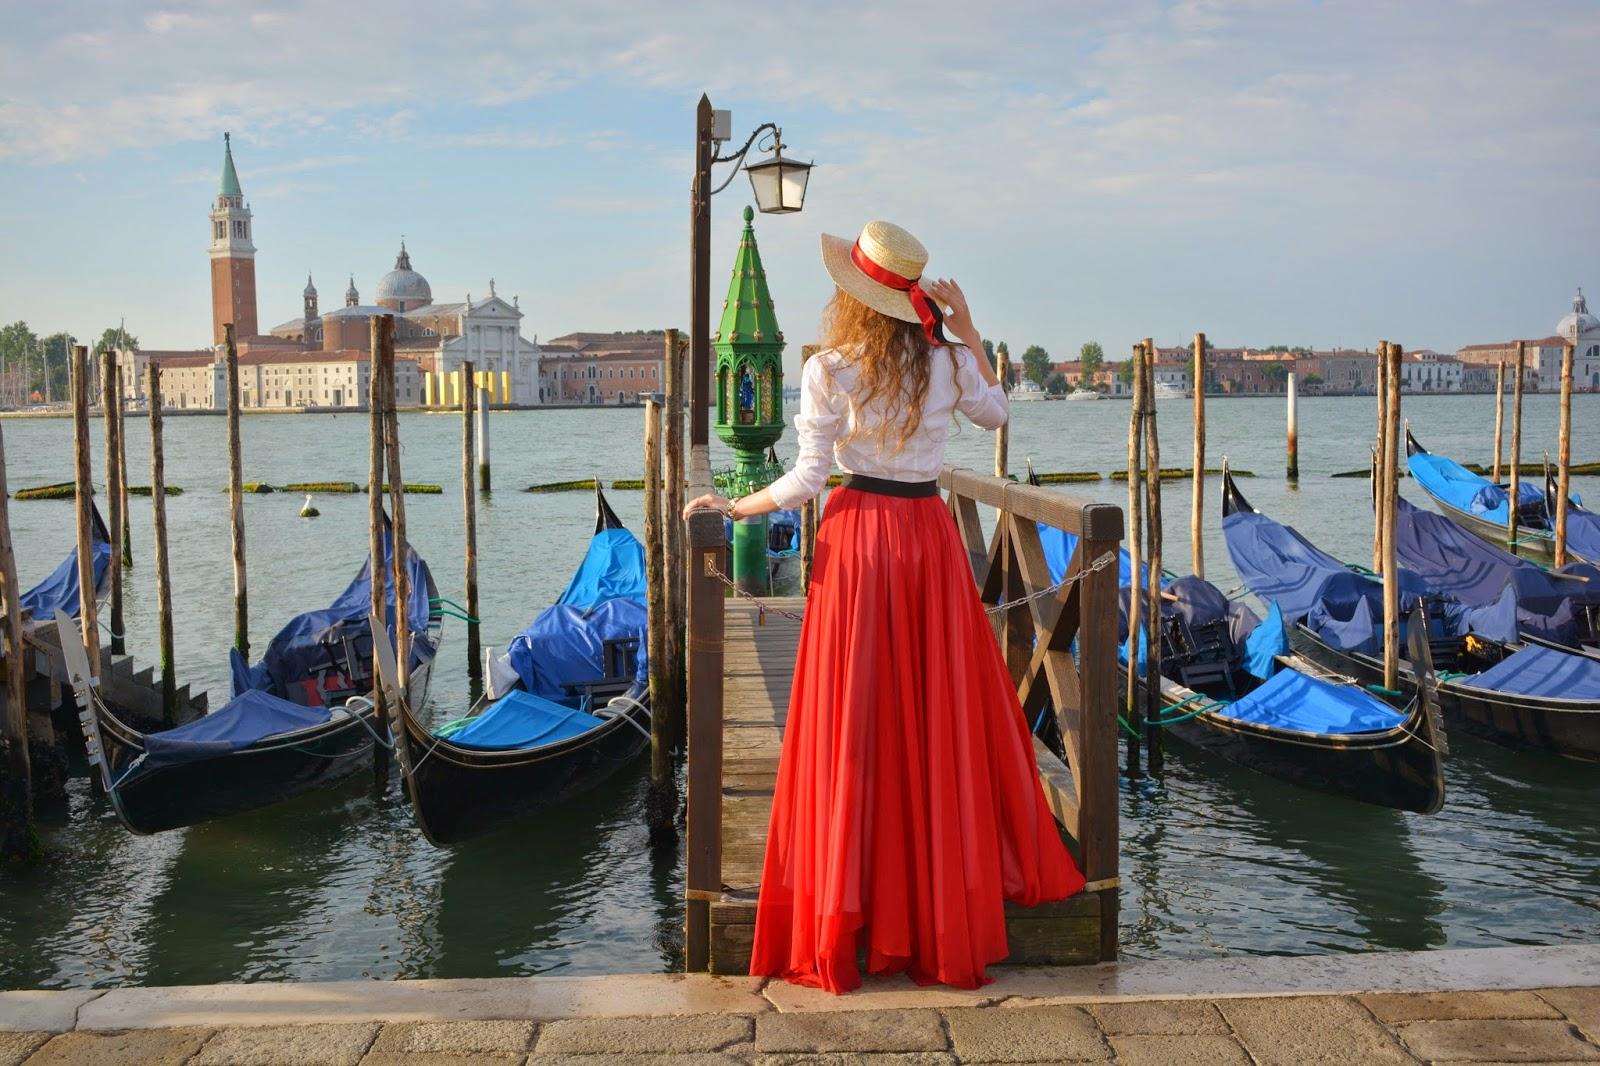 фотосессия на фоне гондол в венеции